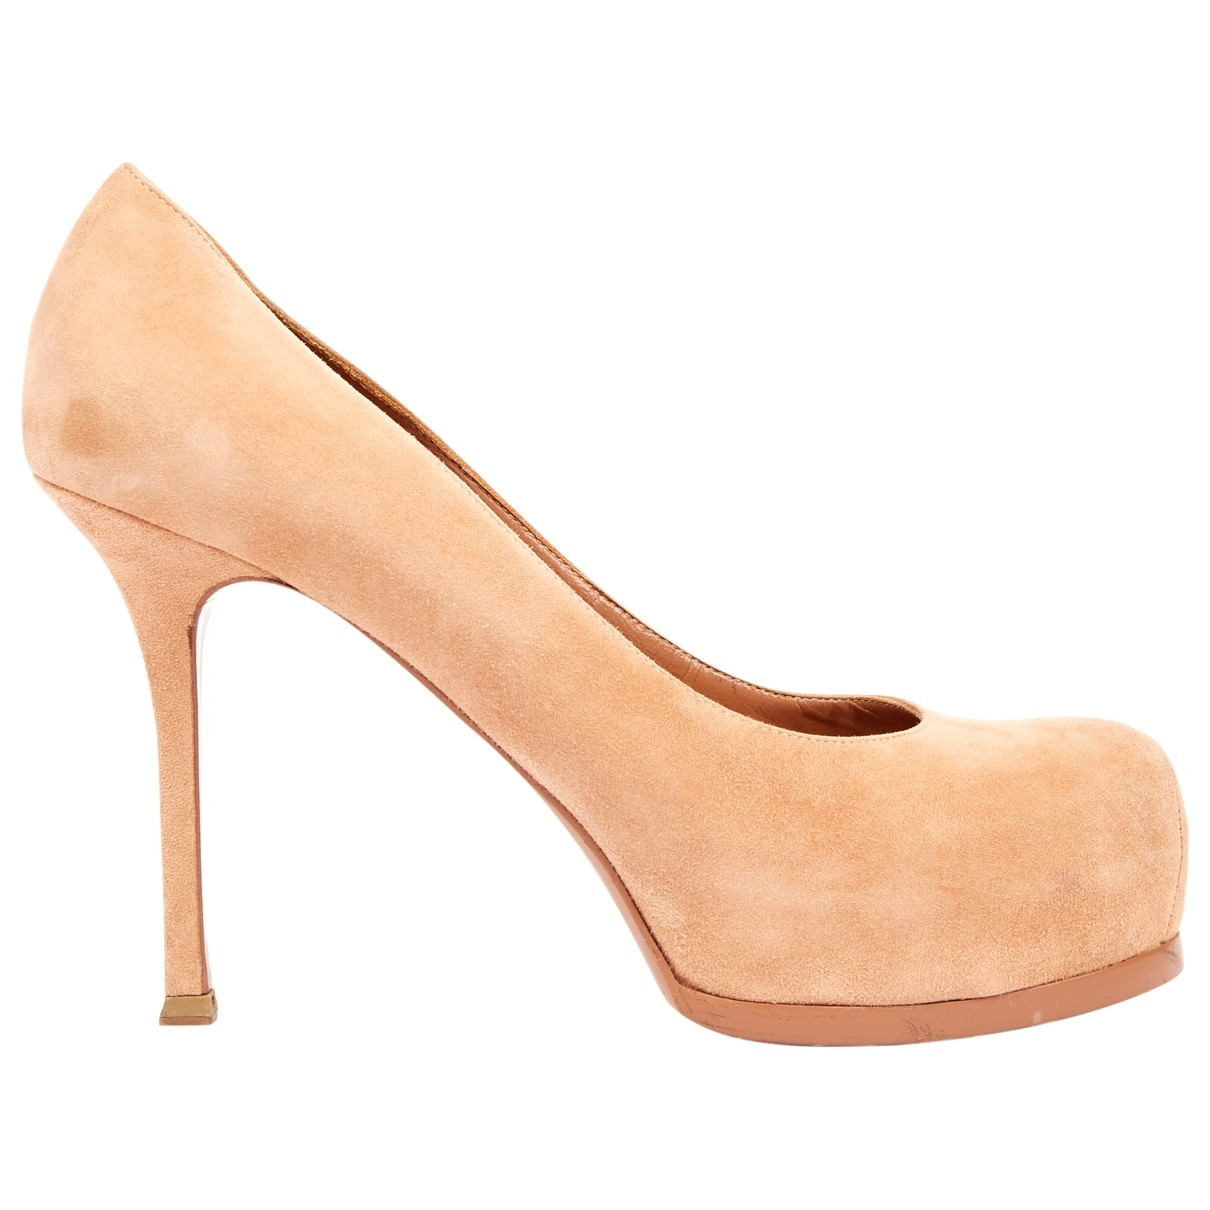 Yves Saint Laurent Trib Too Pink Suede Heels for Women 40 EU